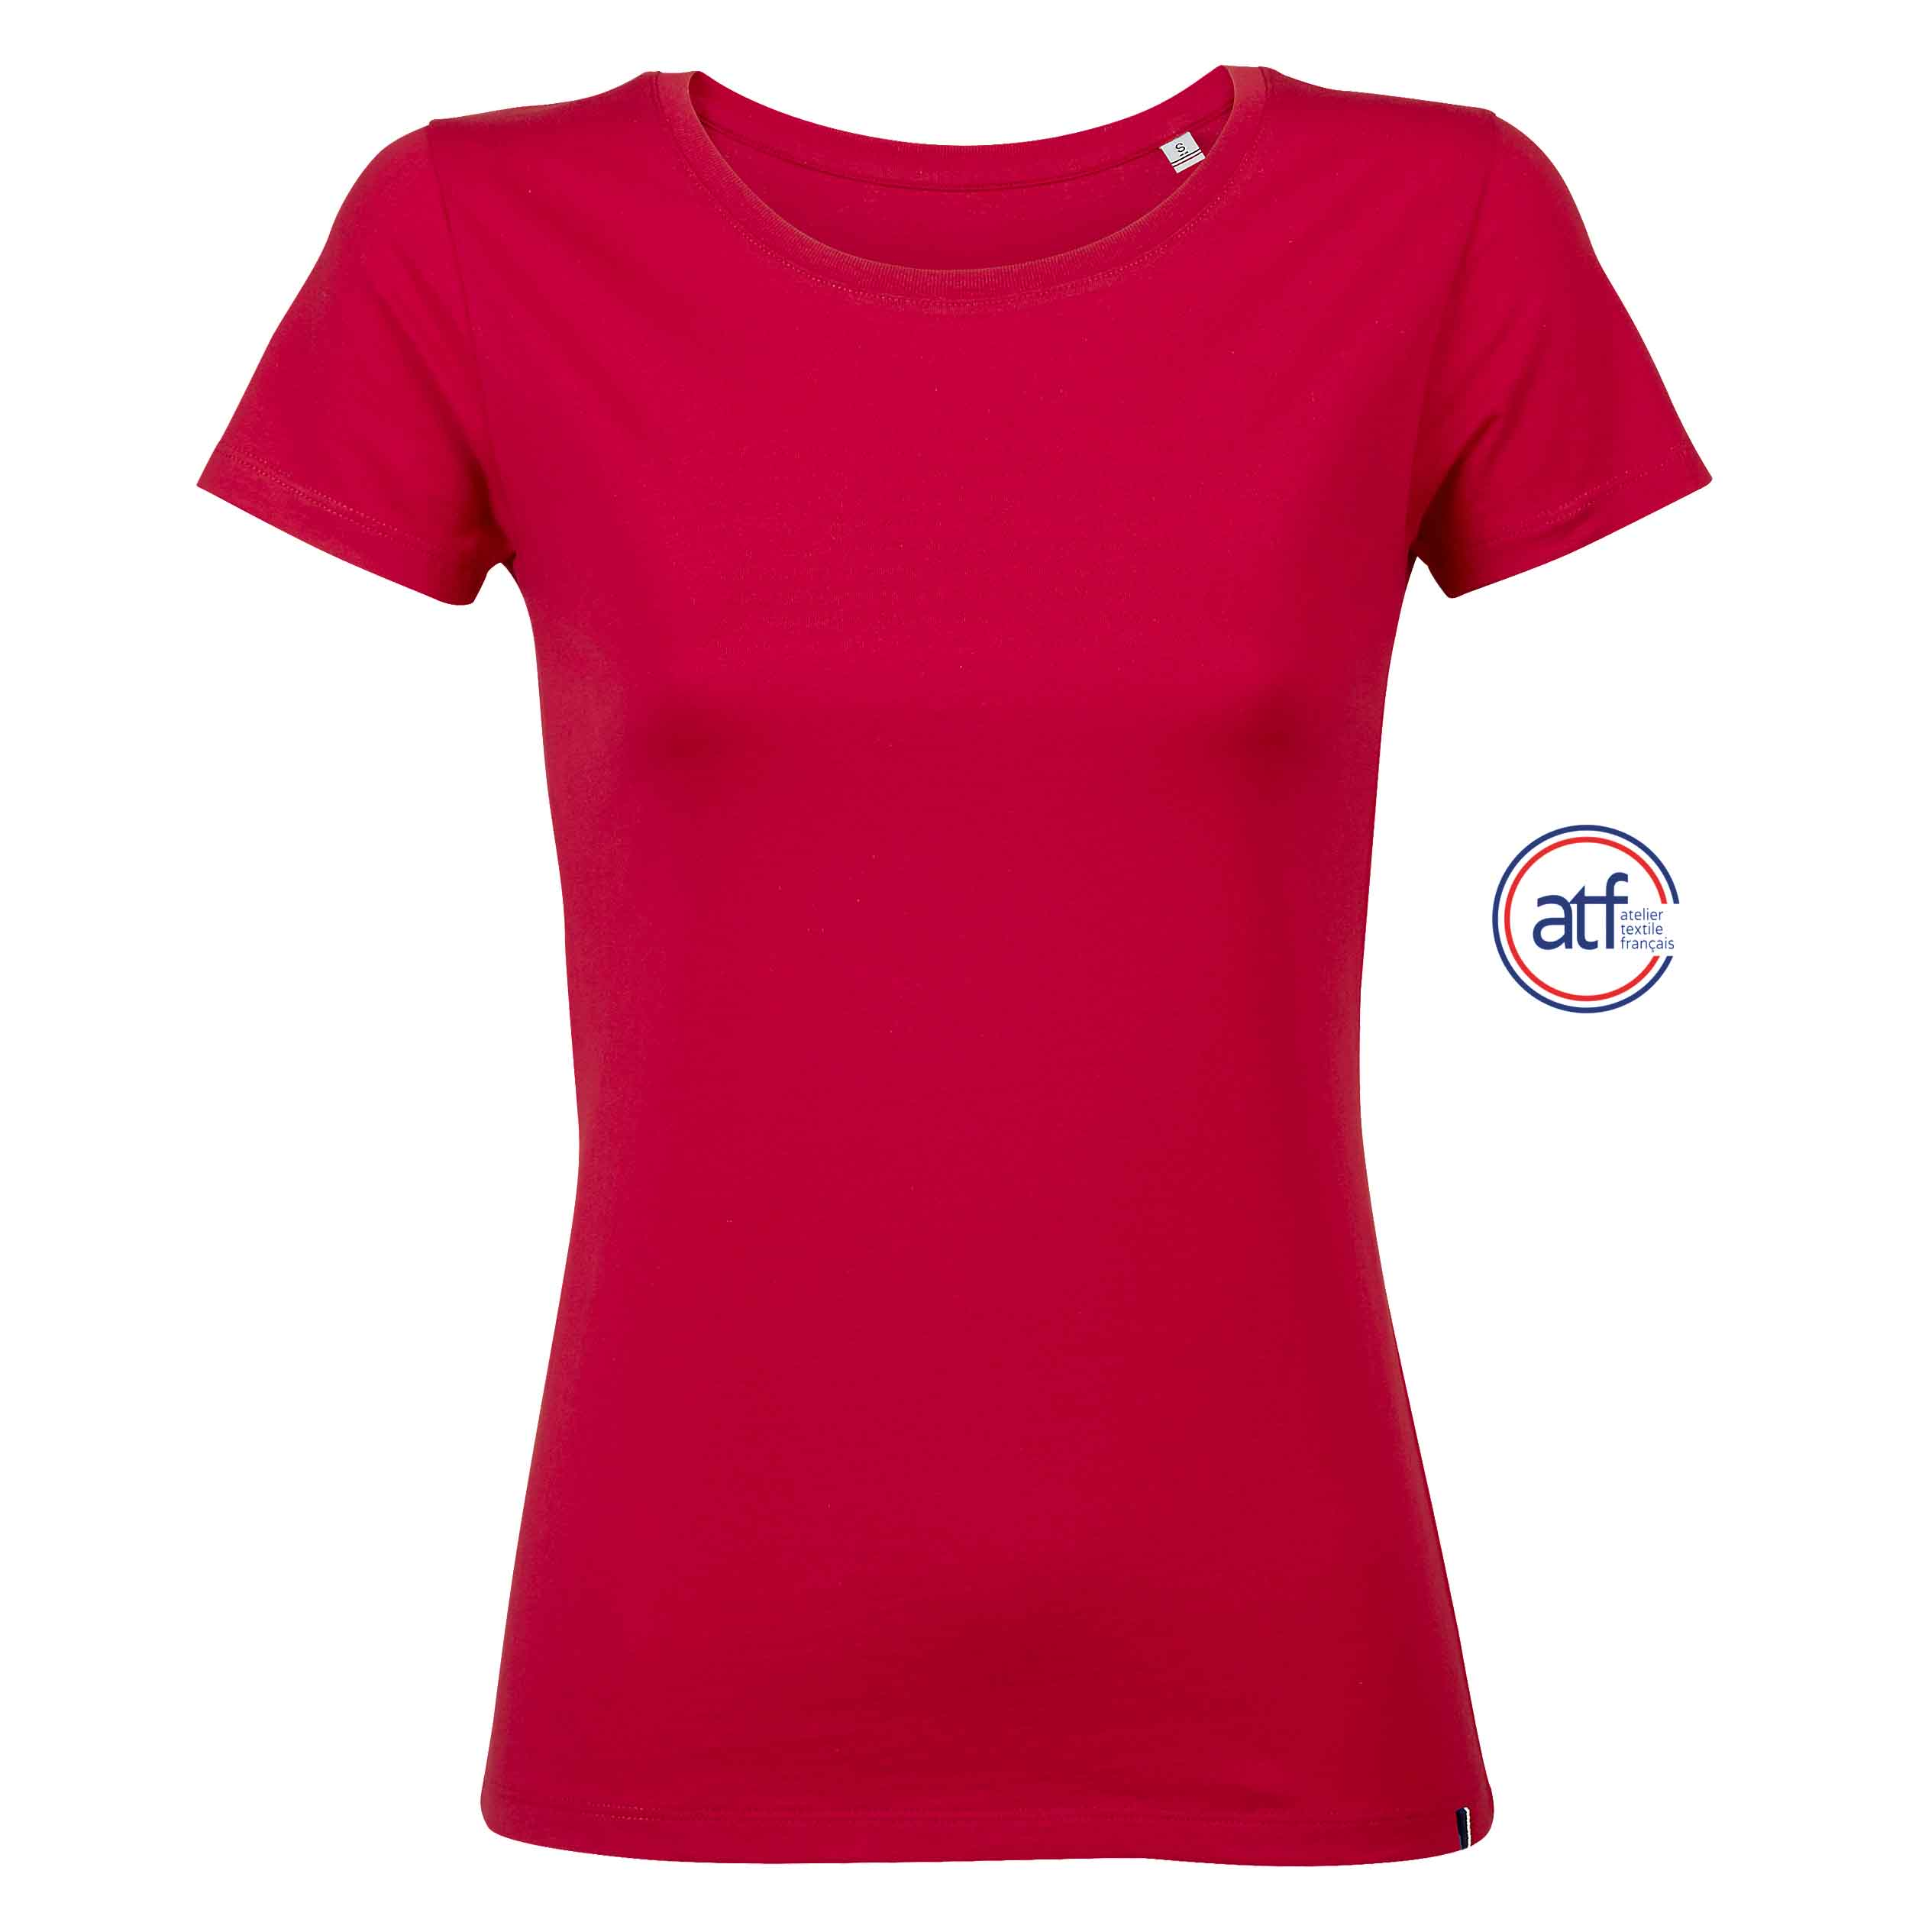 Tee-shirt femme Lola - 1-1447-4